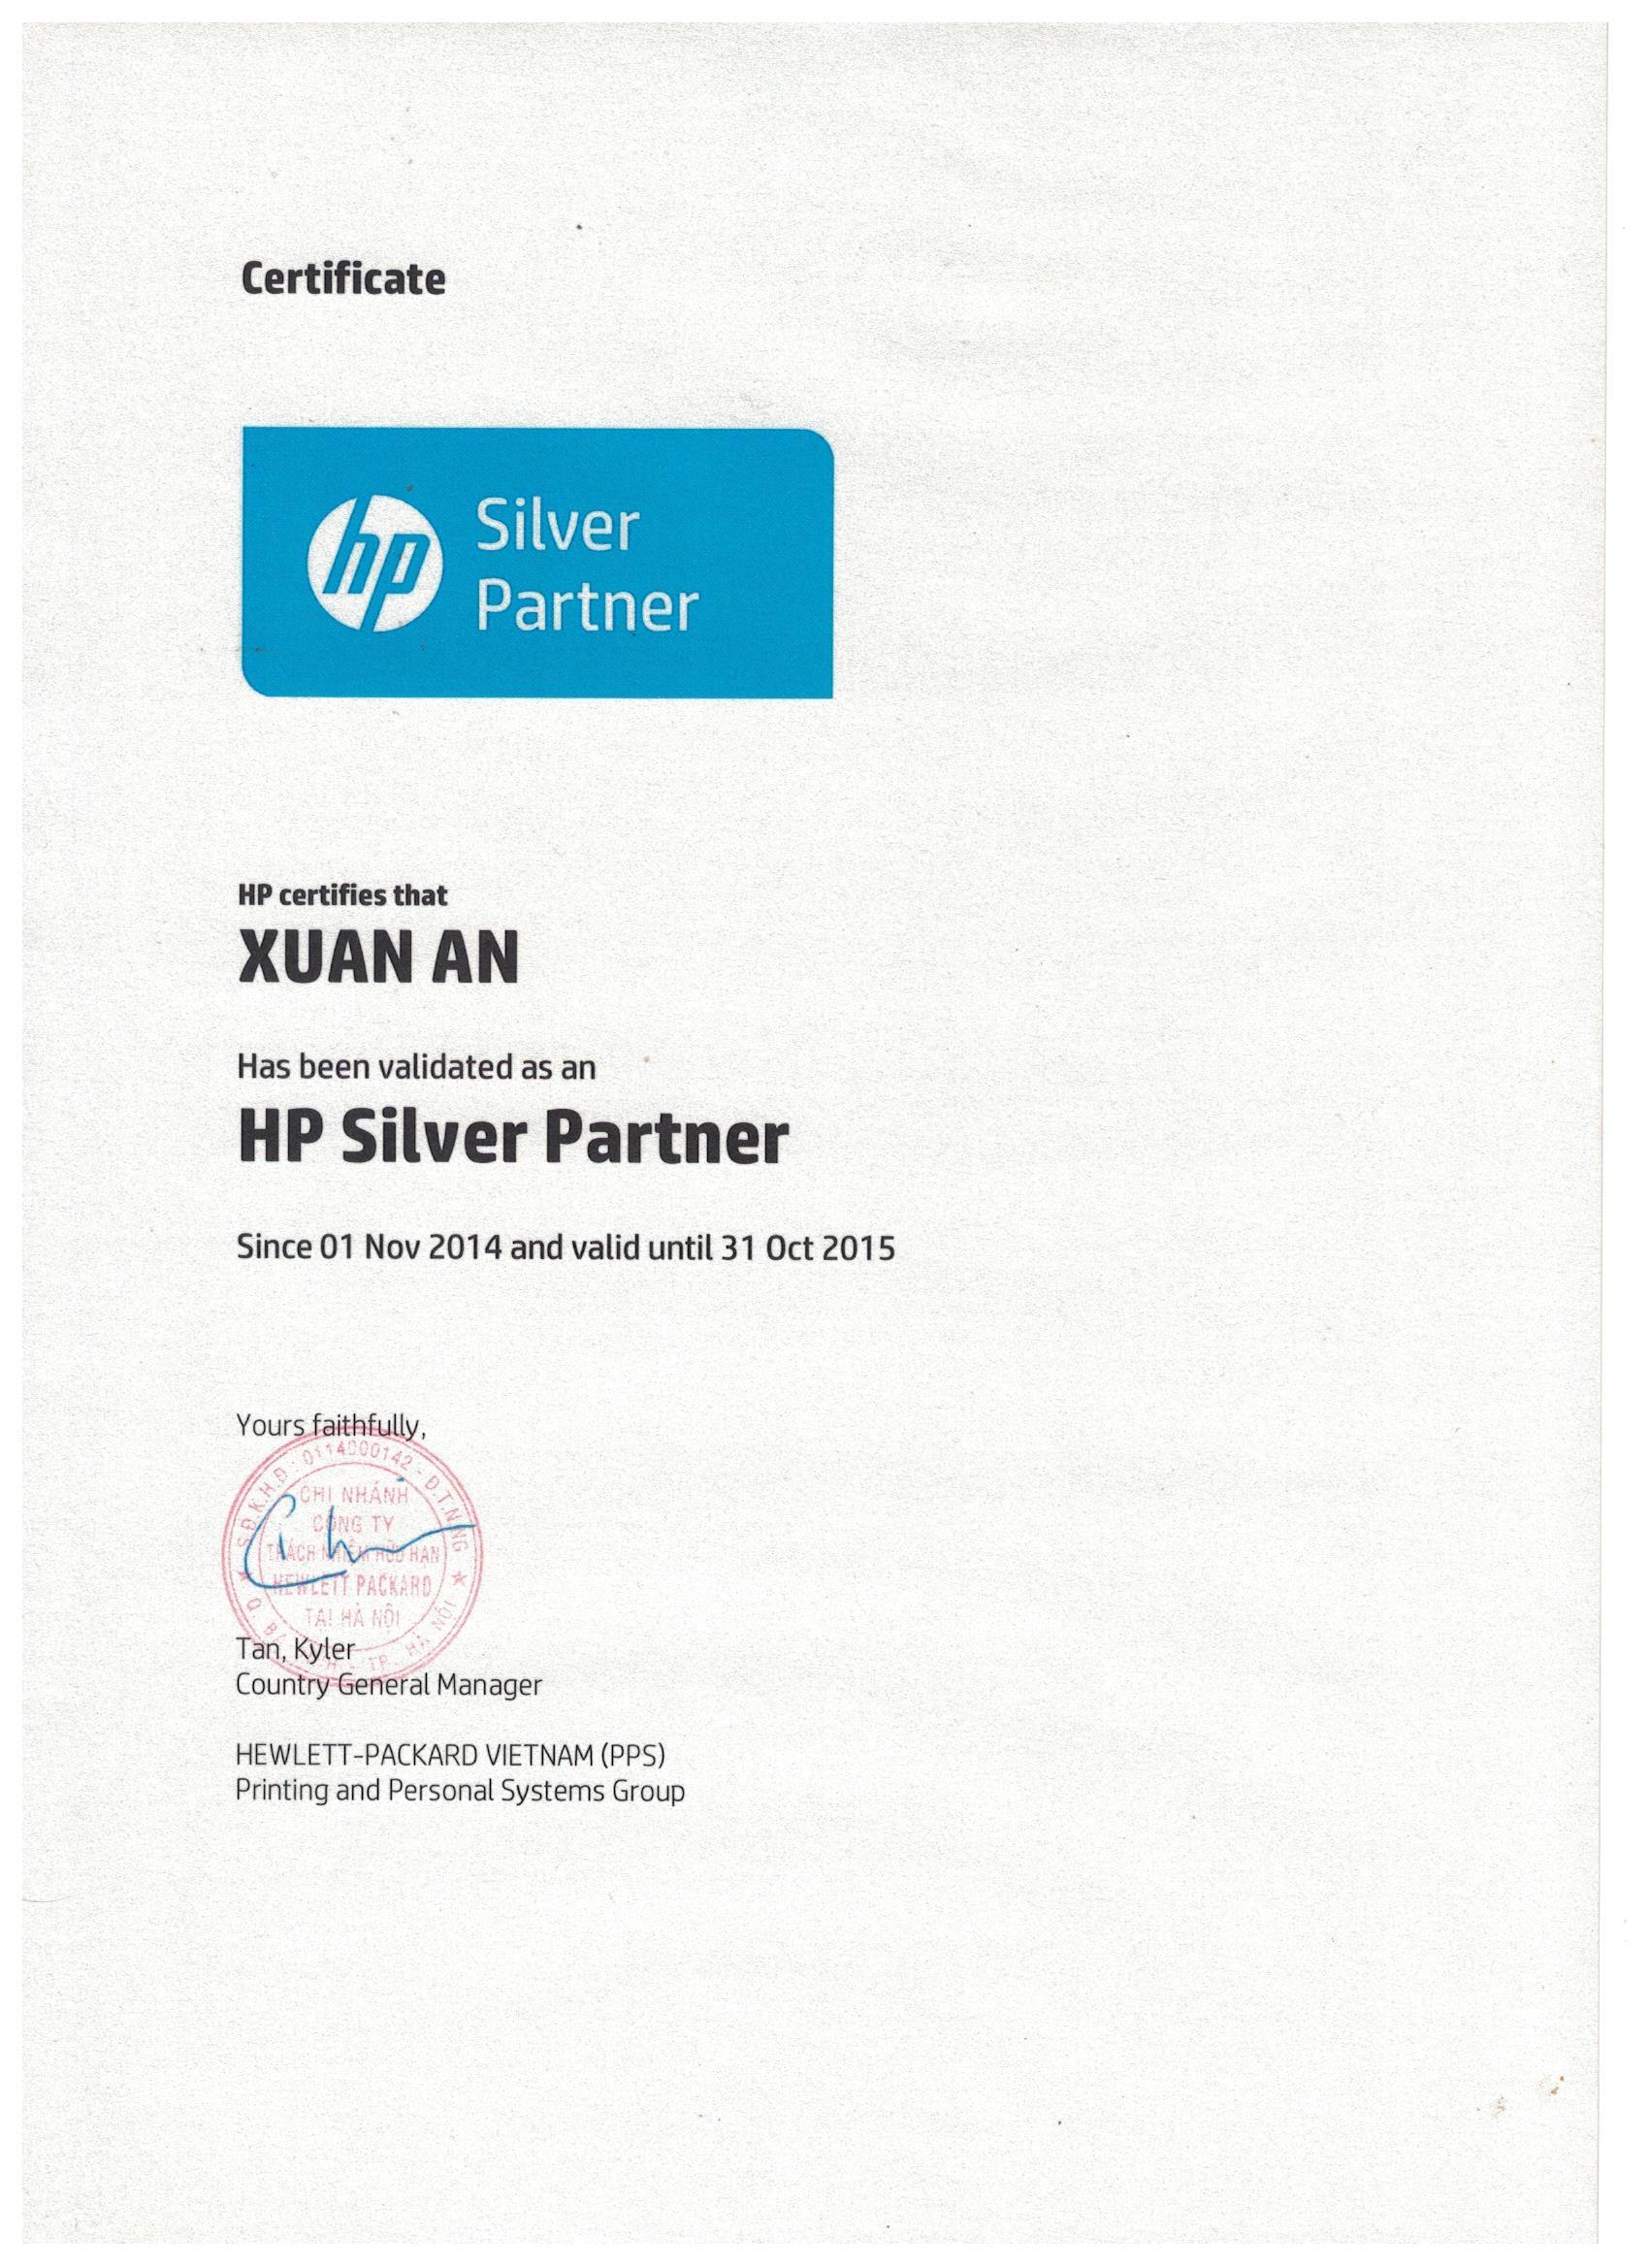 HP Probook 430 G7 - 9GP99PA (Silver)